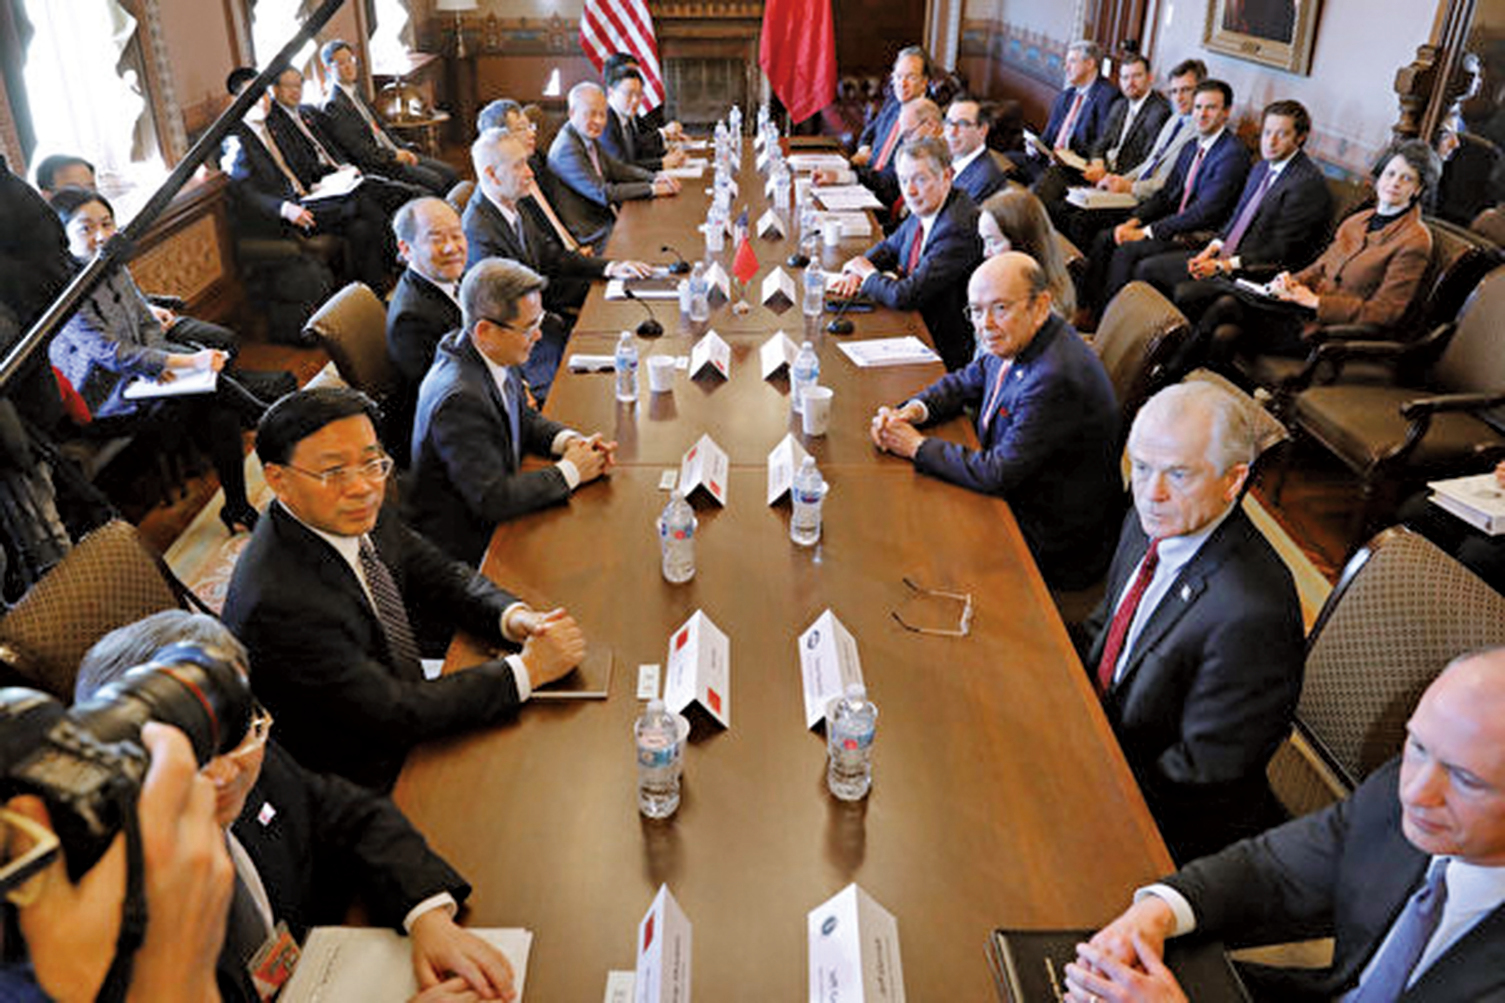 2019年1月底在華盛頓舉行的中美貿易談判。(Getty Images)